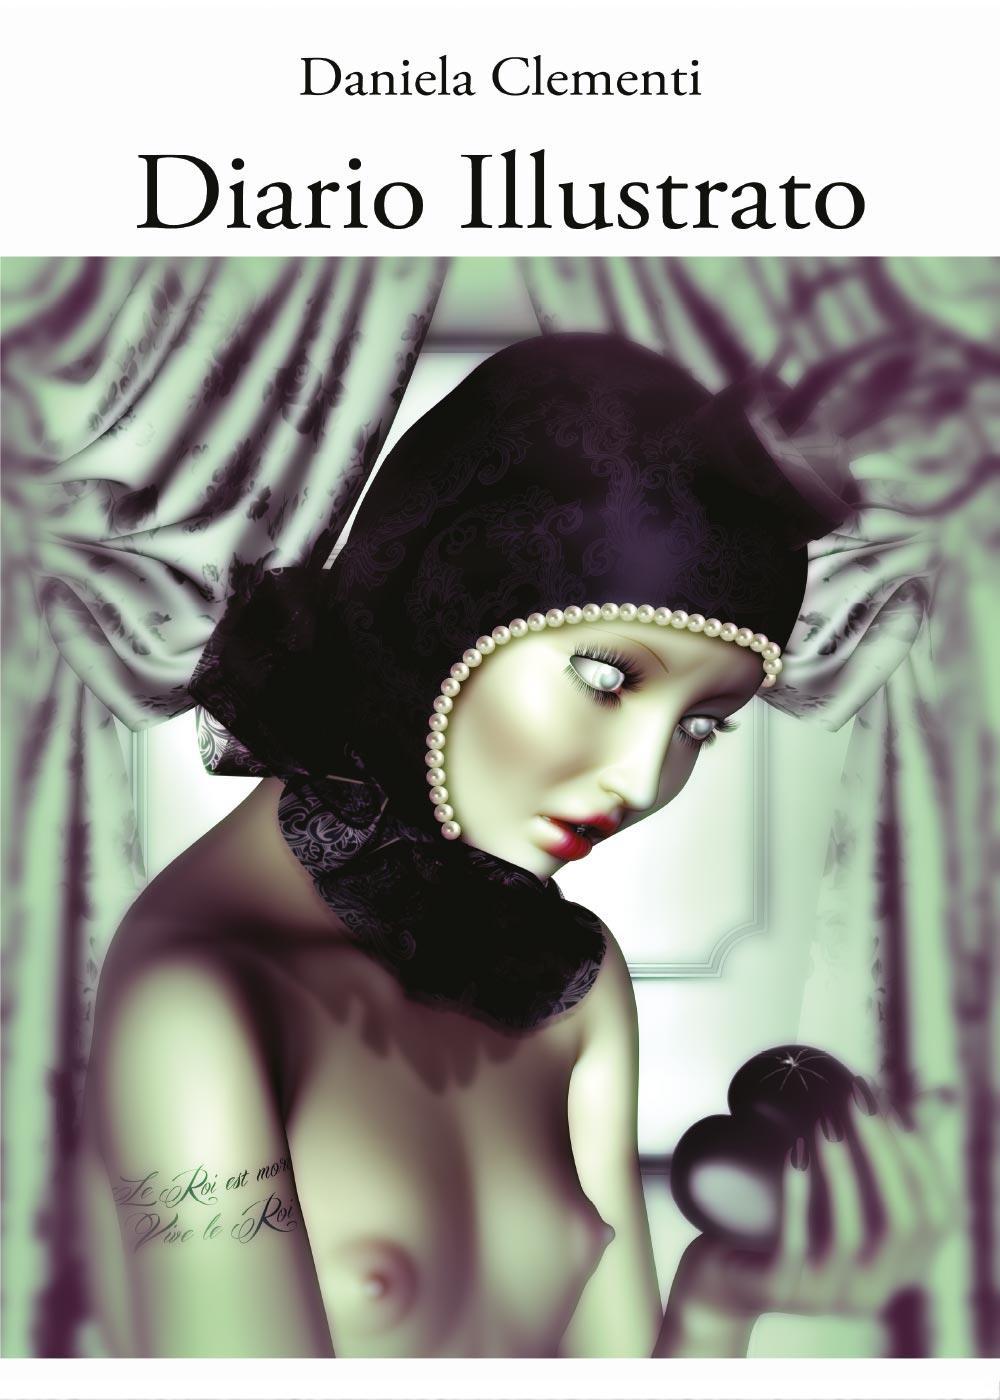 Diario Illustrato